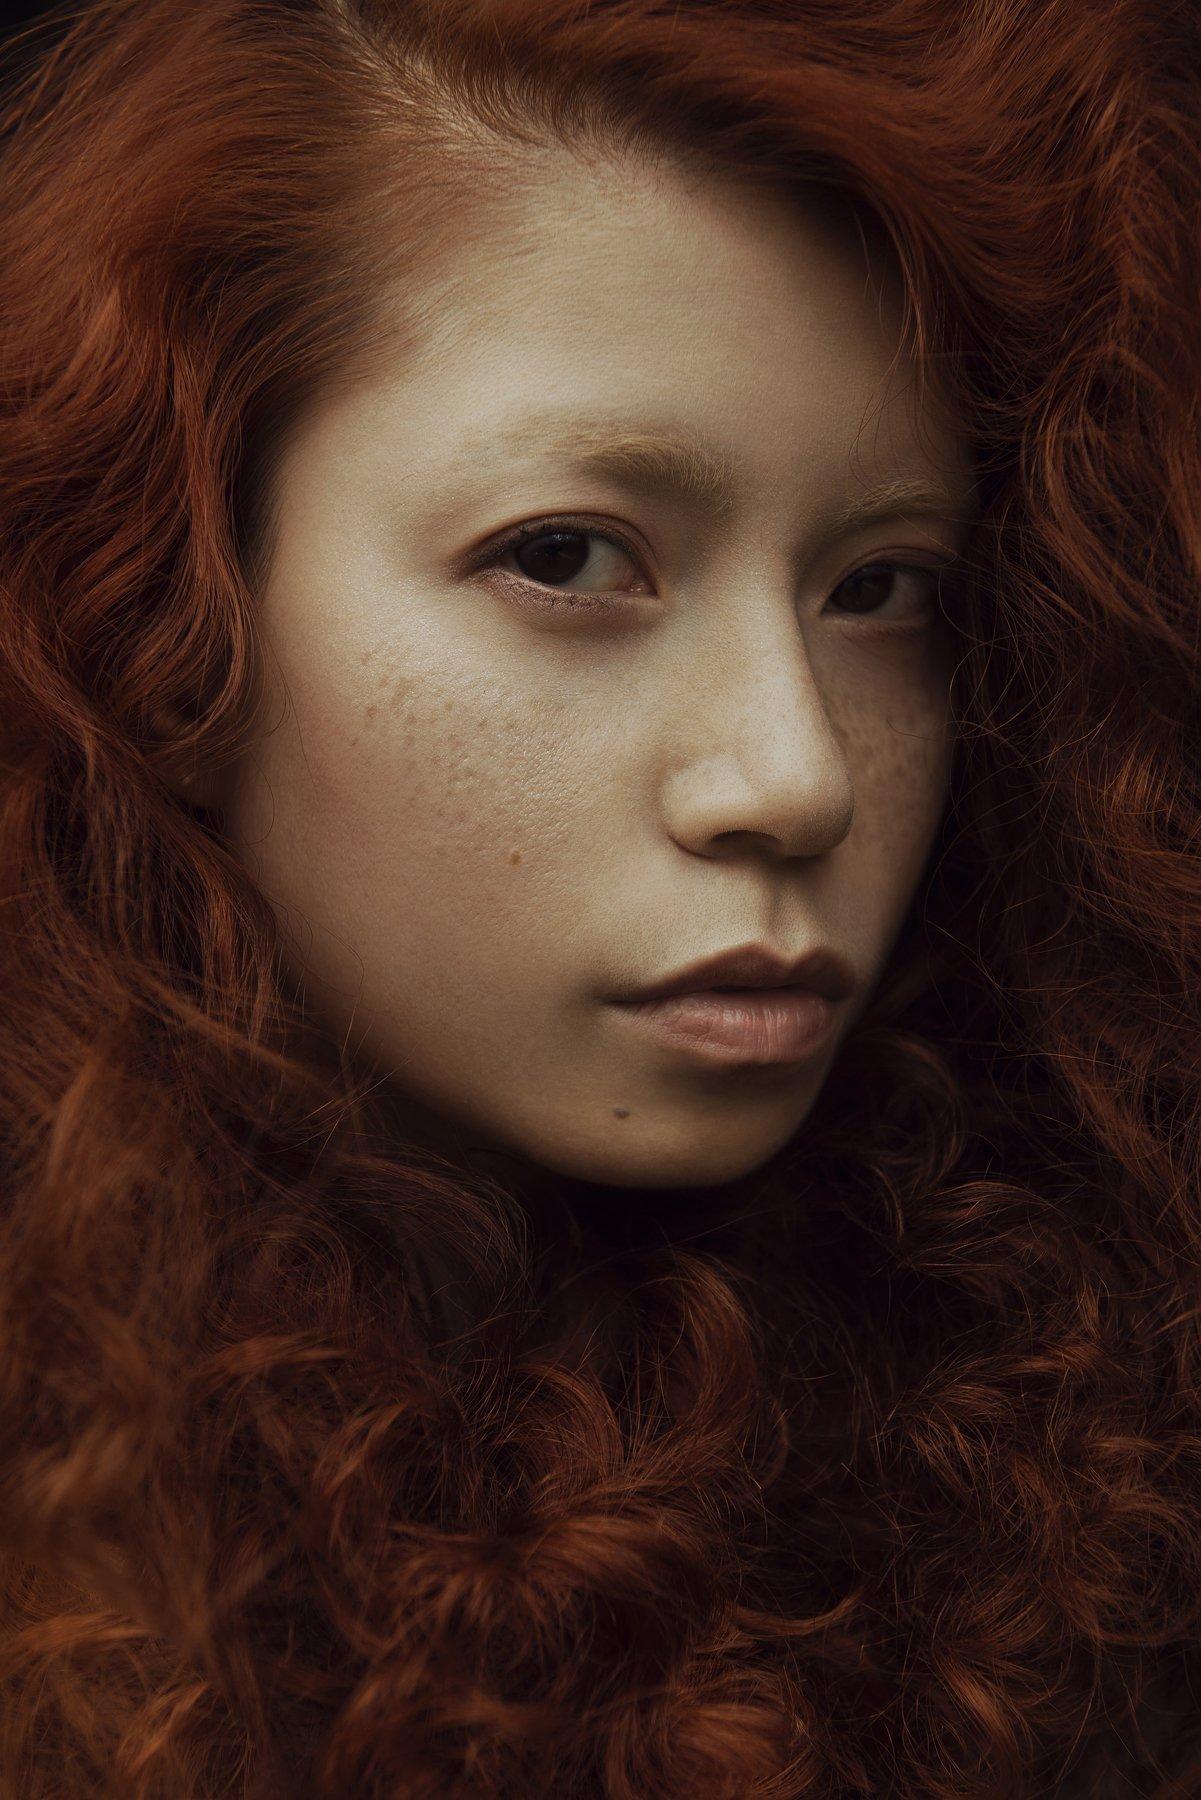 carolinemadison, portrait, beauty, redhair, redhead, portraiture, curlyhair,  asian, emotion, longhair,, Caroline Madison